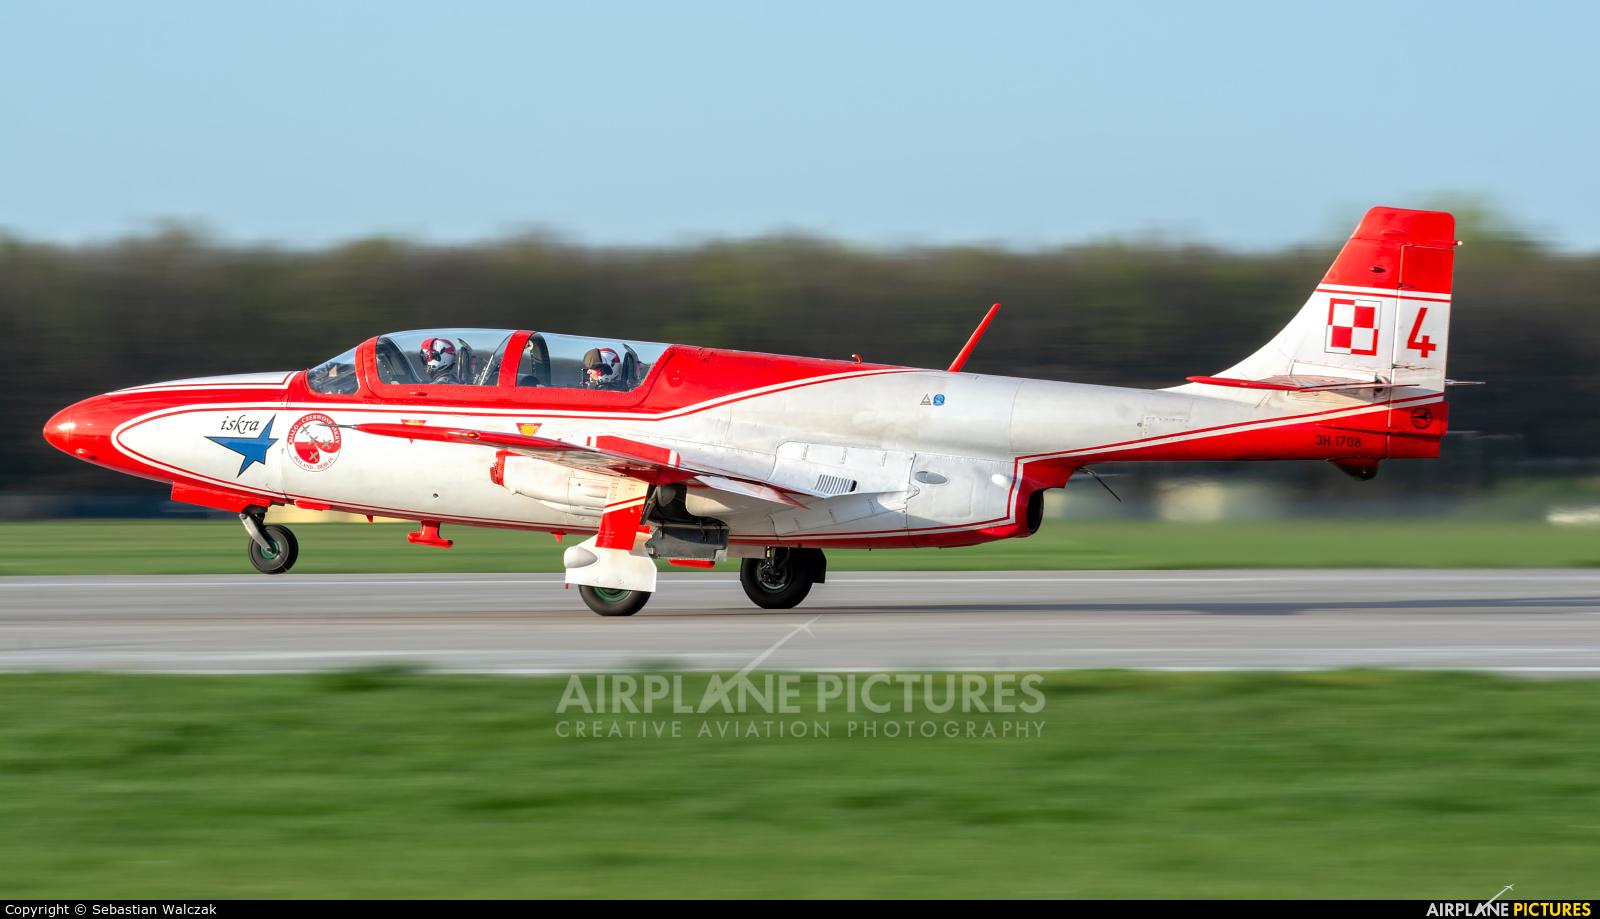 Poland - Air Force: White & Red Iskras 3H 1708 aircraft at Dęblin